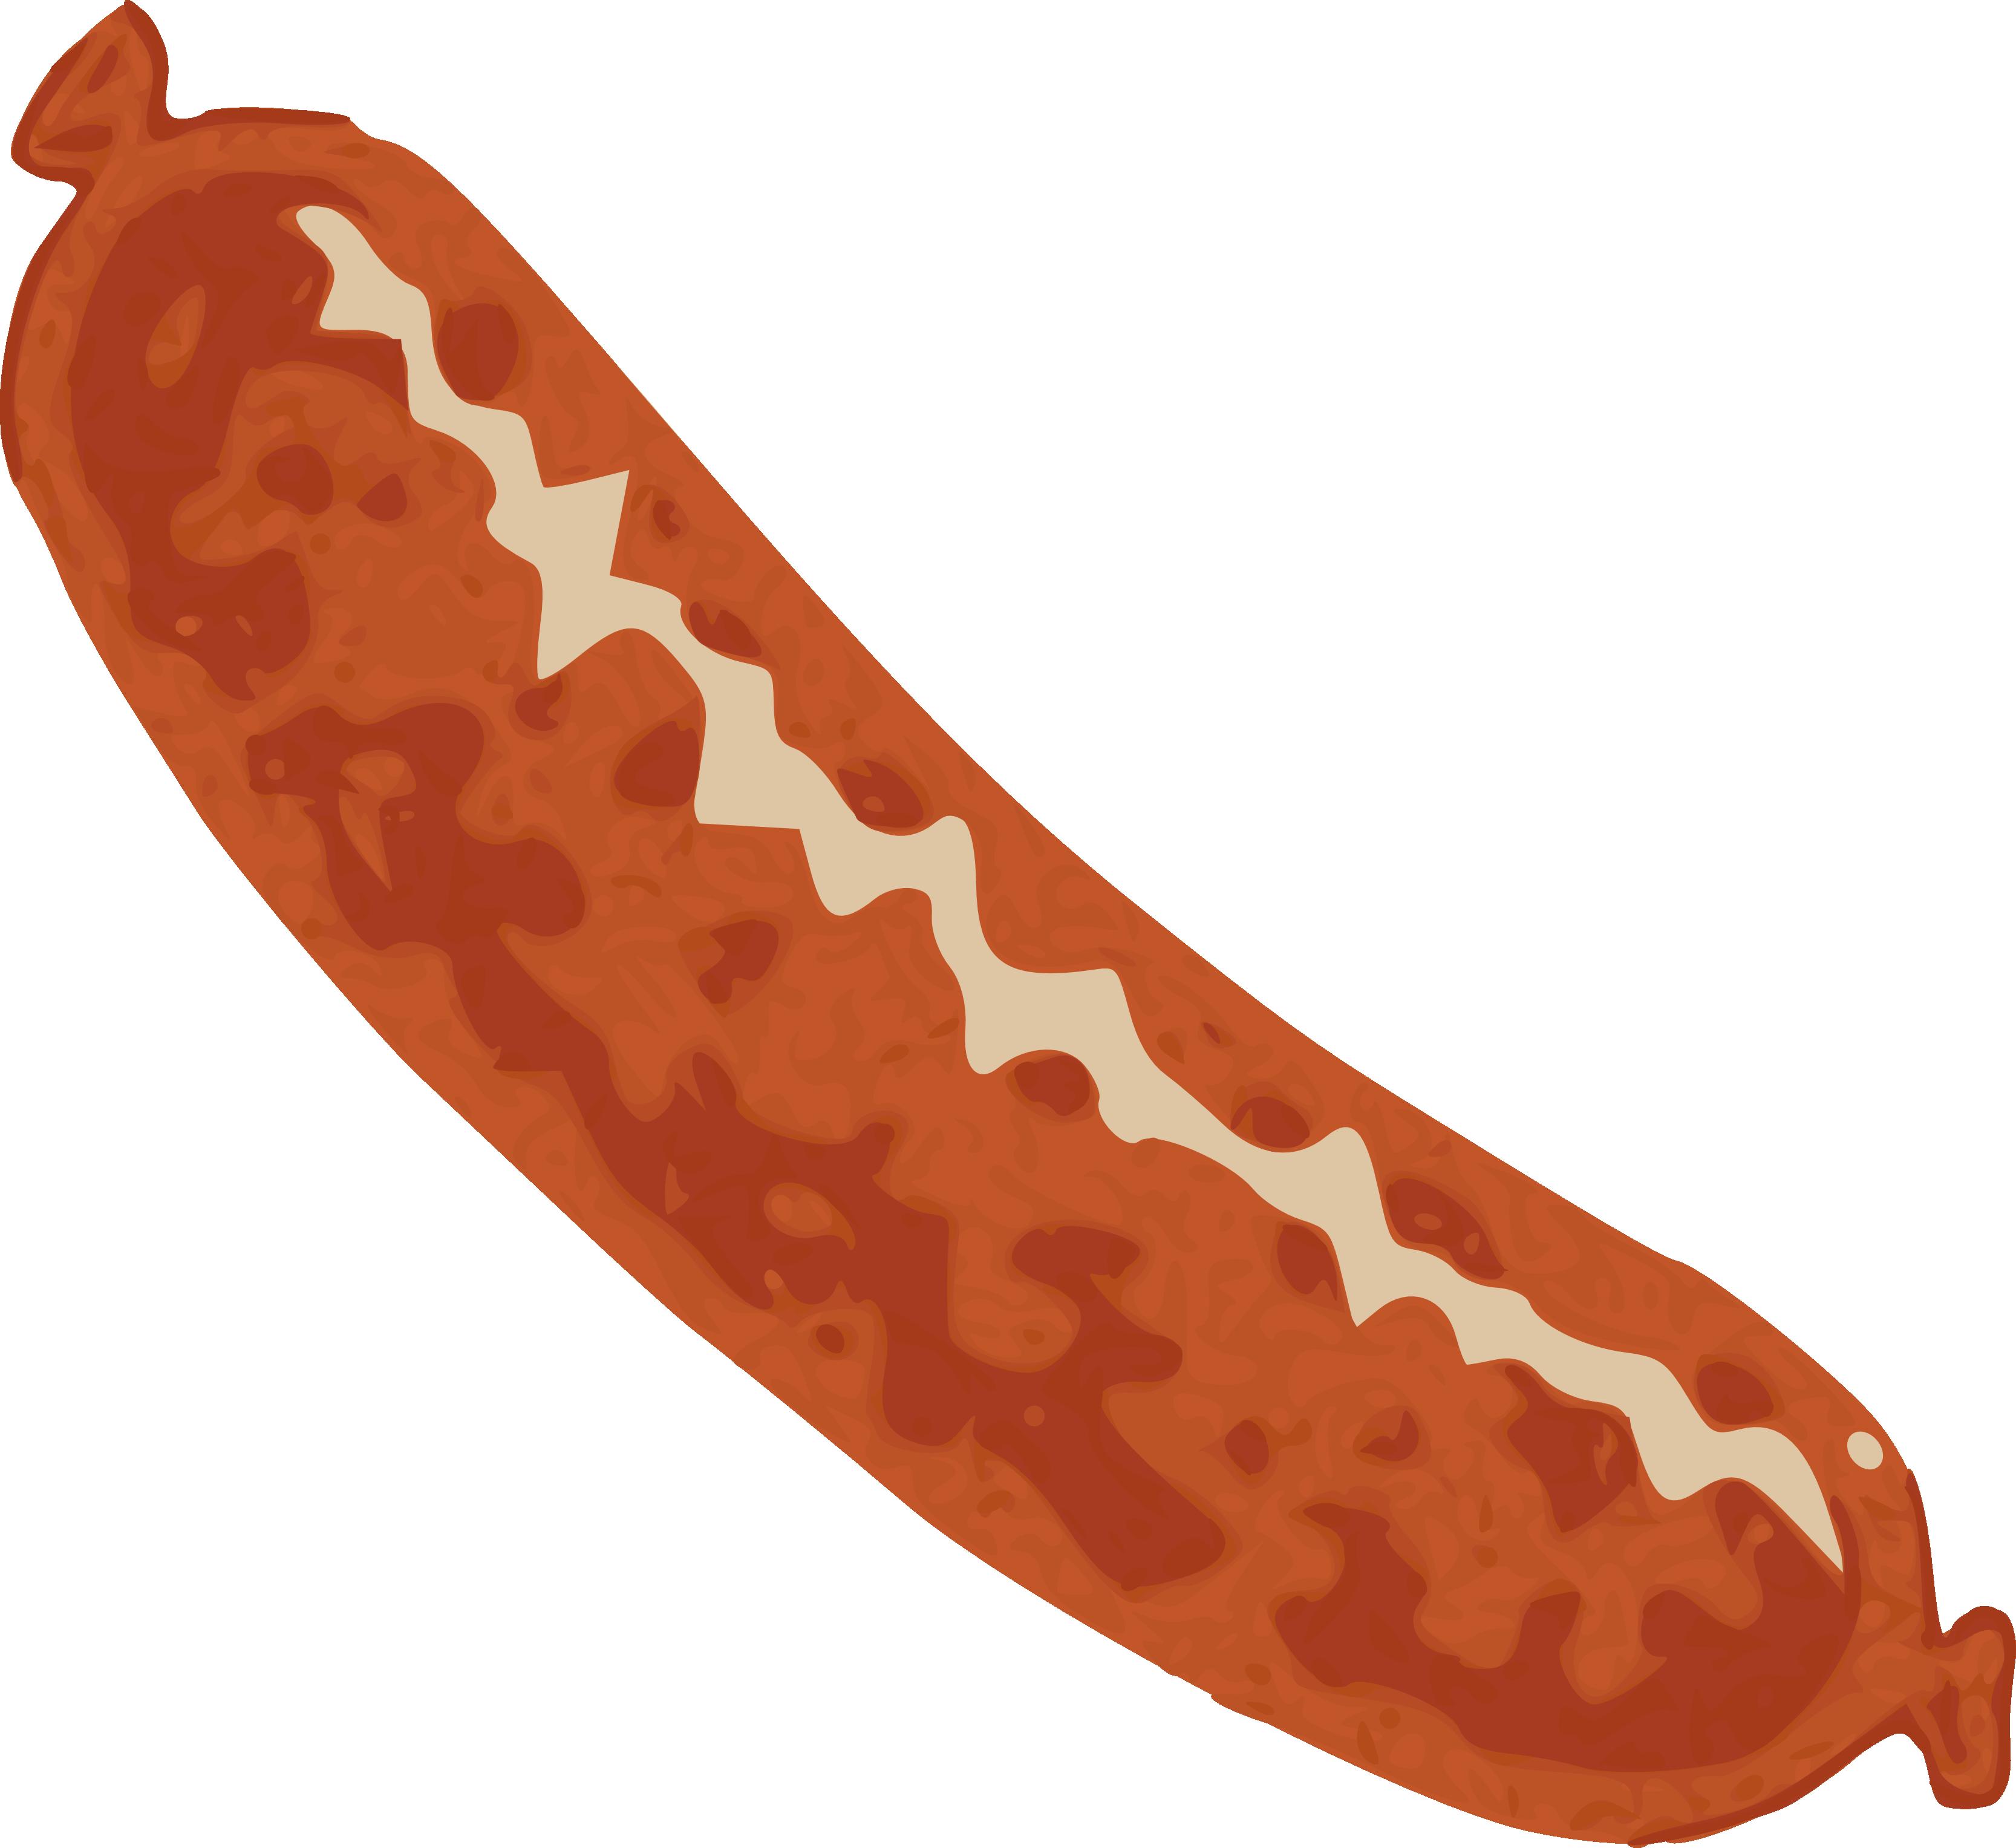 Hotdog clipart frankfurter. Sausage panda free images